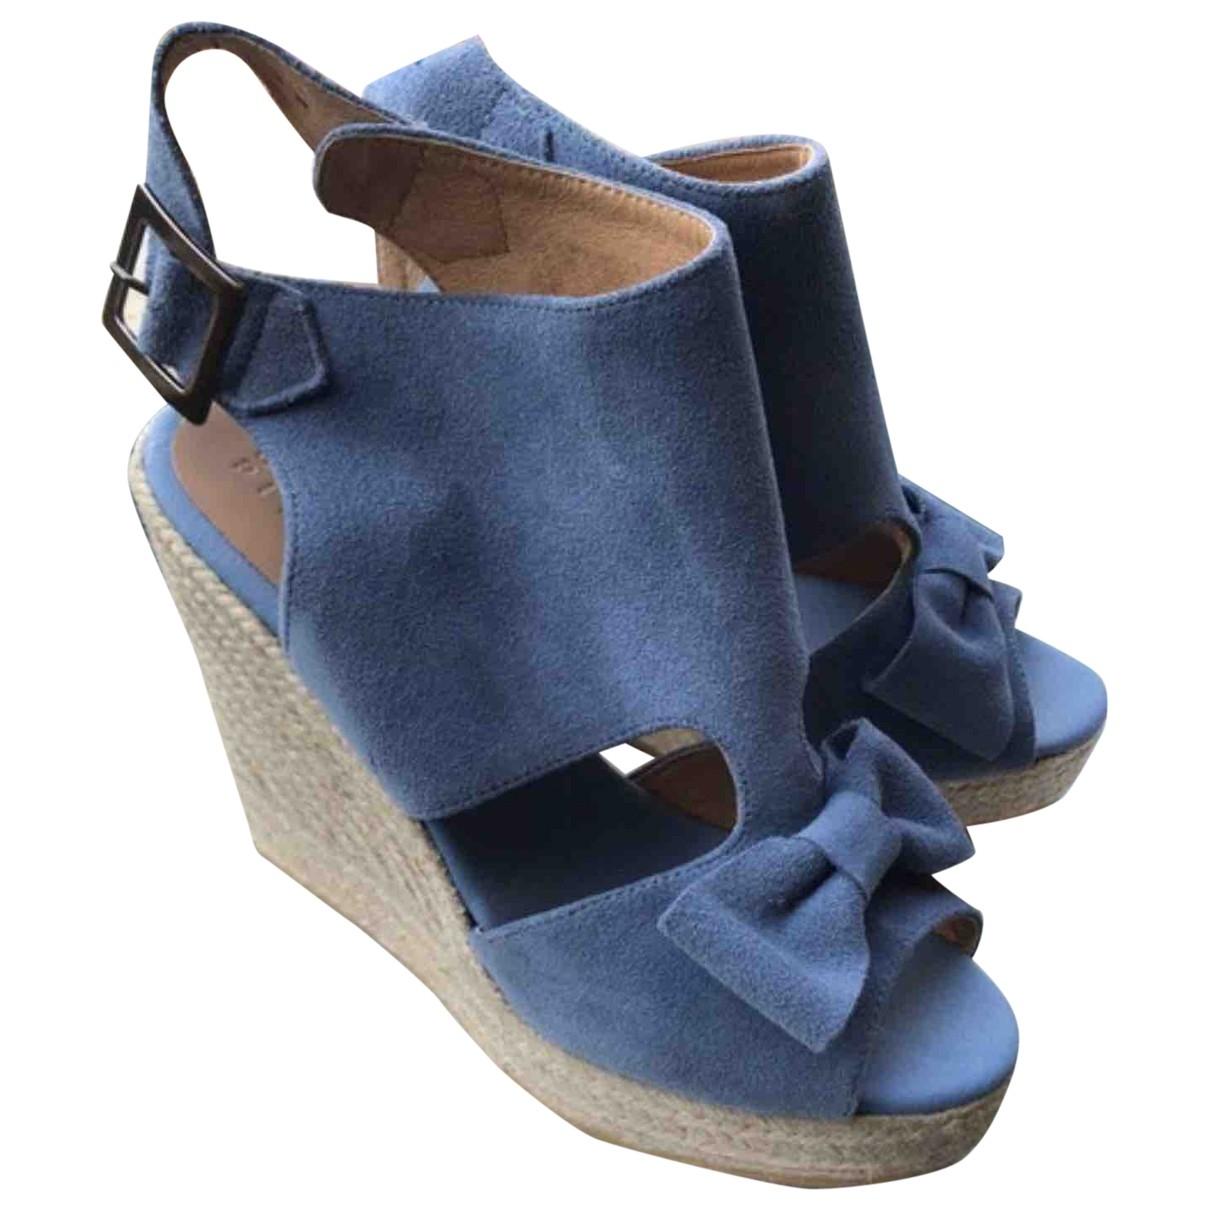 Claudie Pierlot \N Blue Suede Mules & Clogs for Women 40 EU